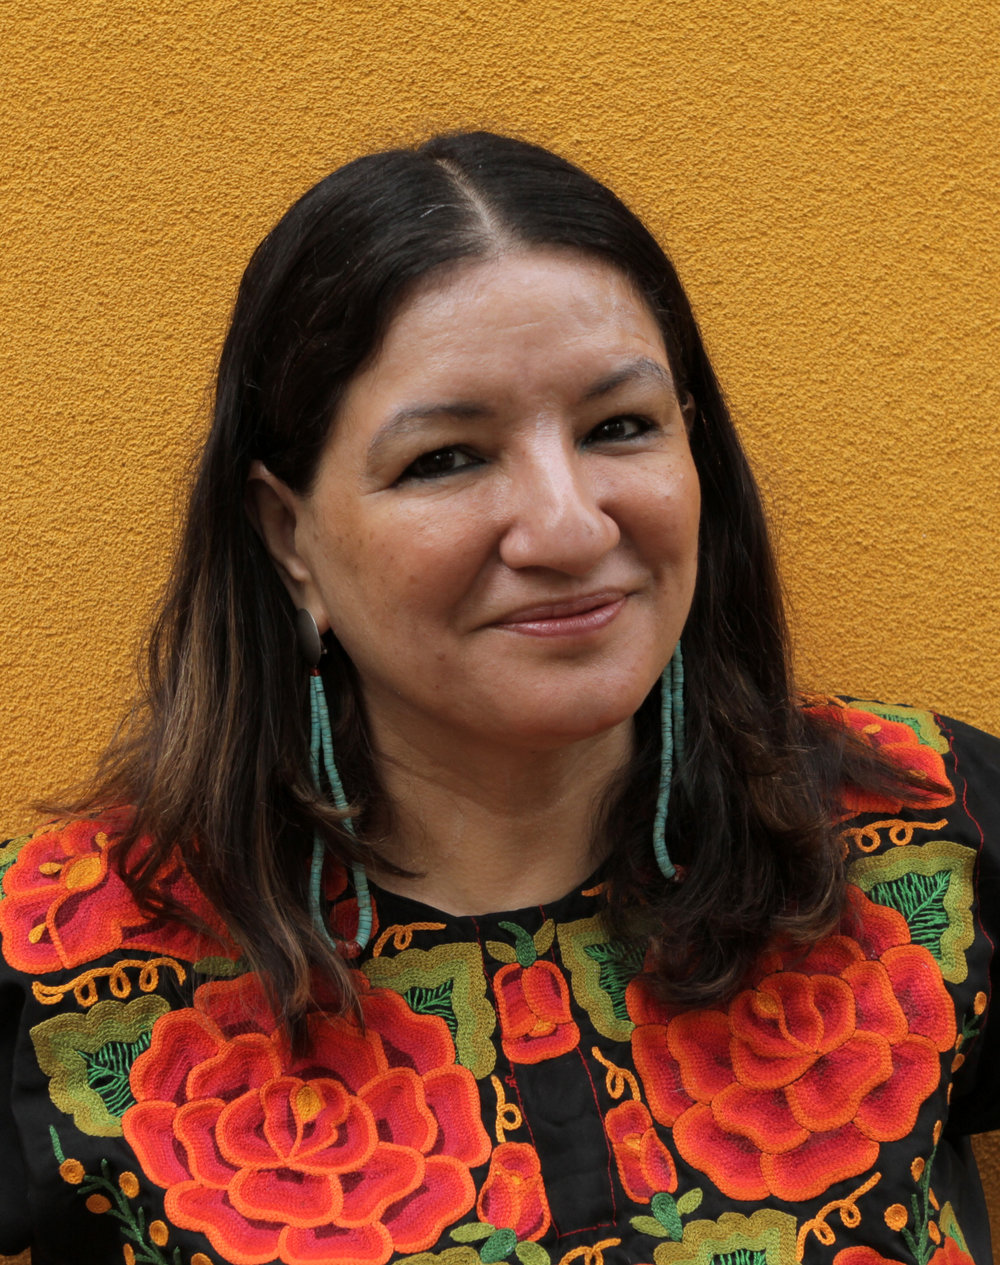 Sandra Cisneros - Mexican-American award winning author and activist.